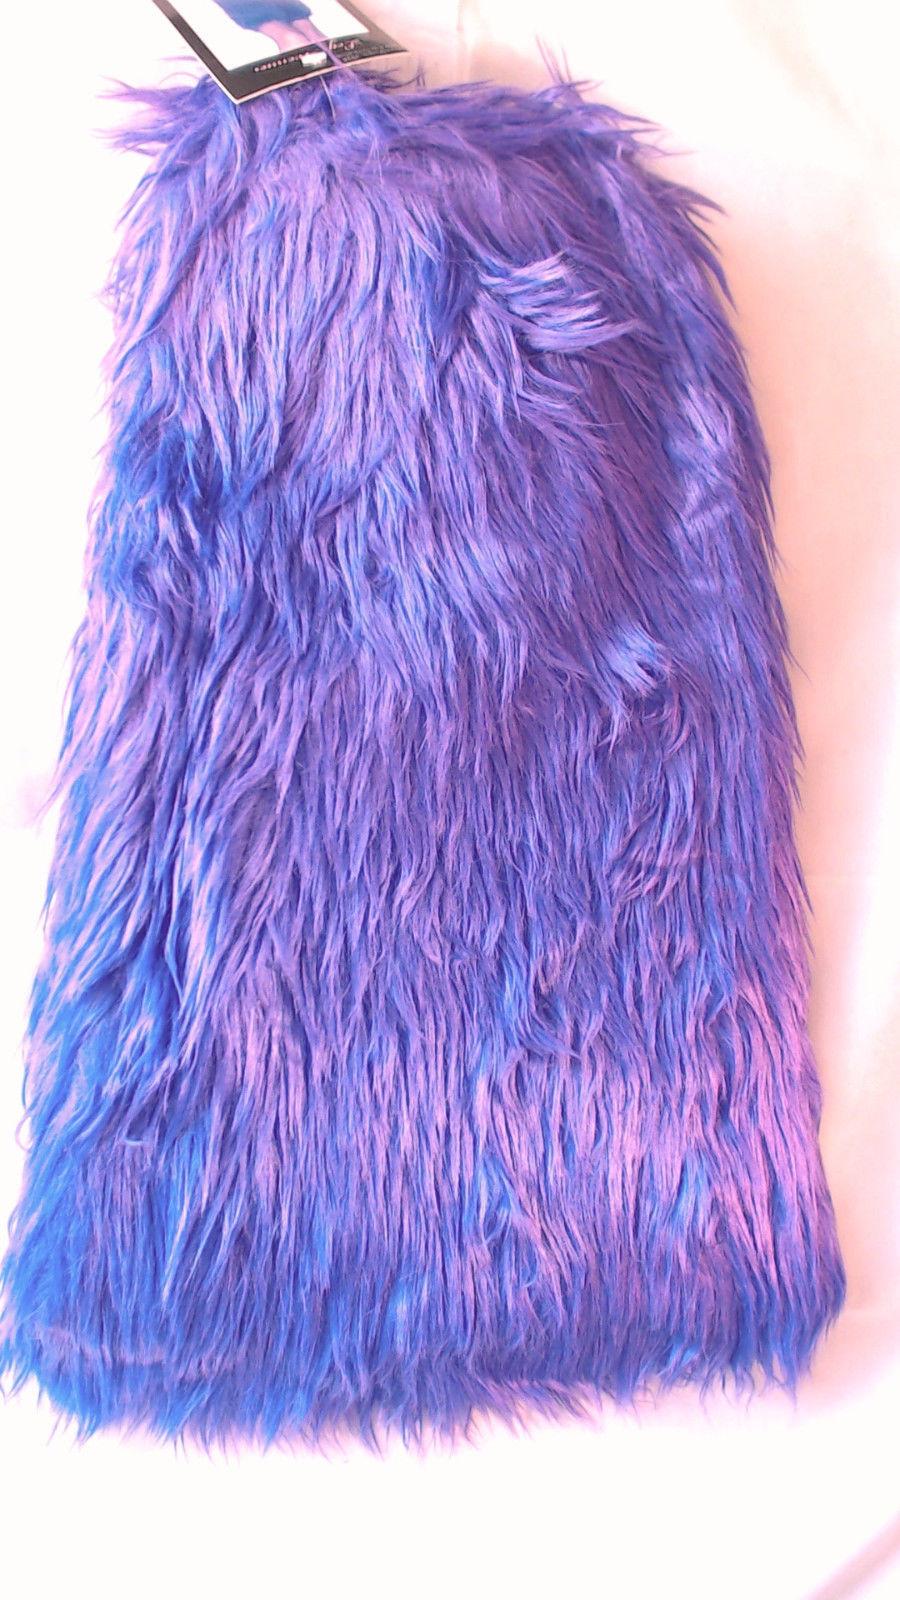 Furry 80u0026#39;s Neon Rave Fuzzy Clubwear Leg Warmers Leg Avenue Costume Accessory NEW | EBay